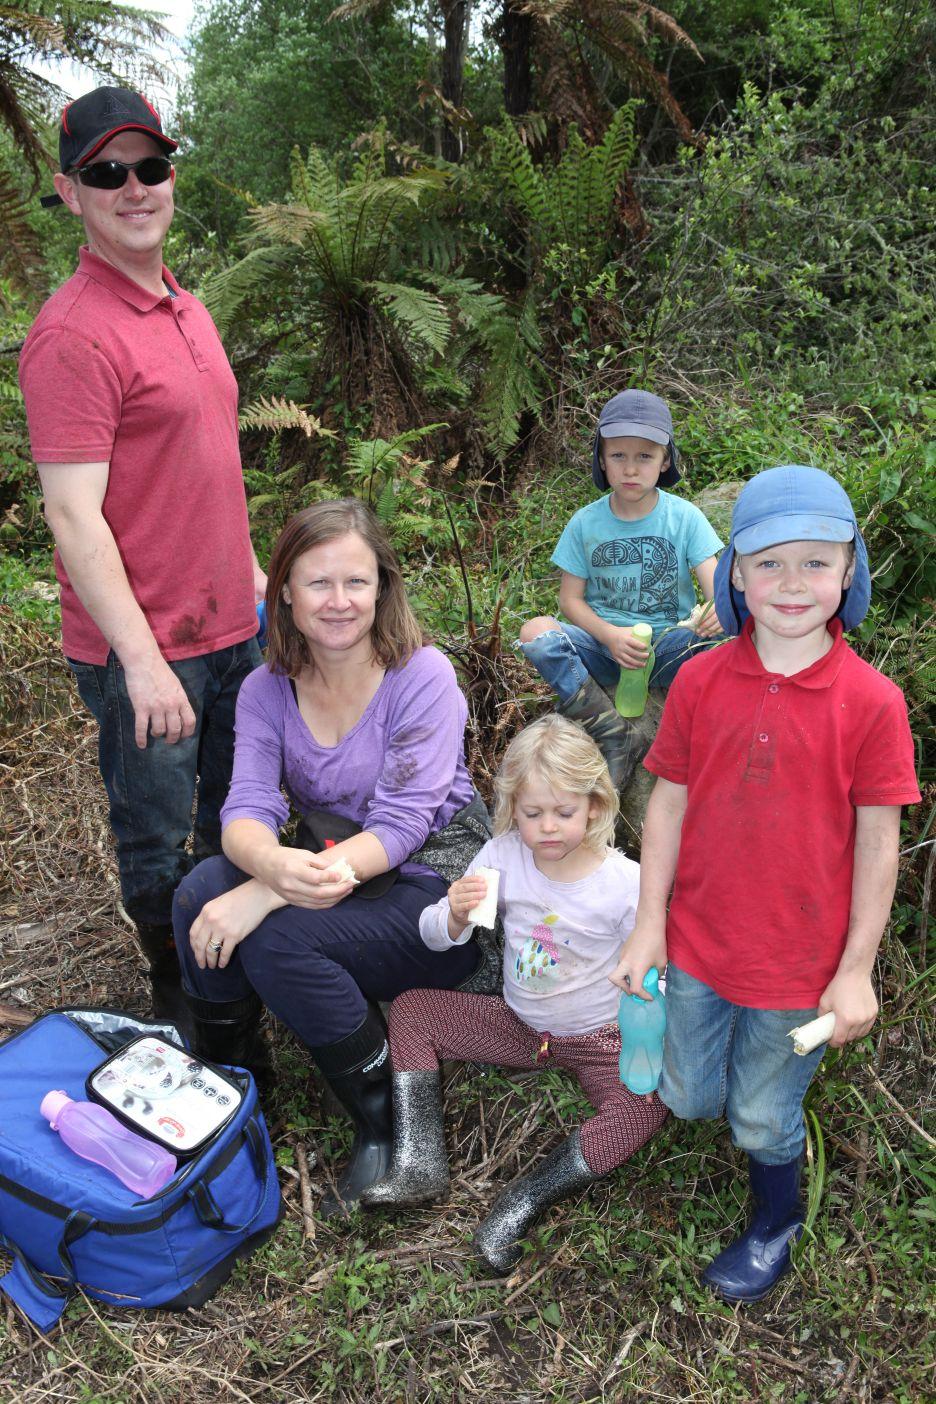 Act-of-Kindness-Volunteer-Waikato-River-Trails-IMG_0605.JPG